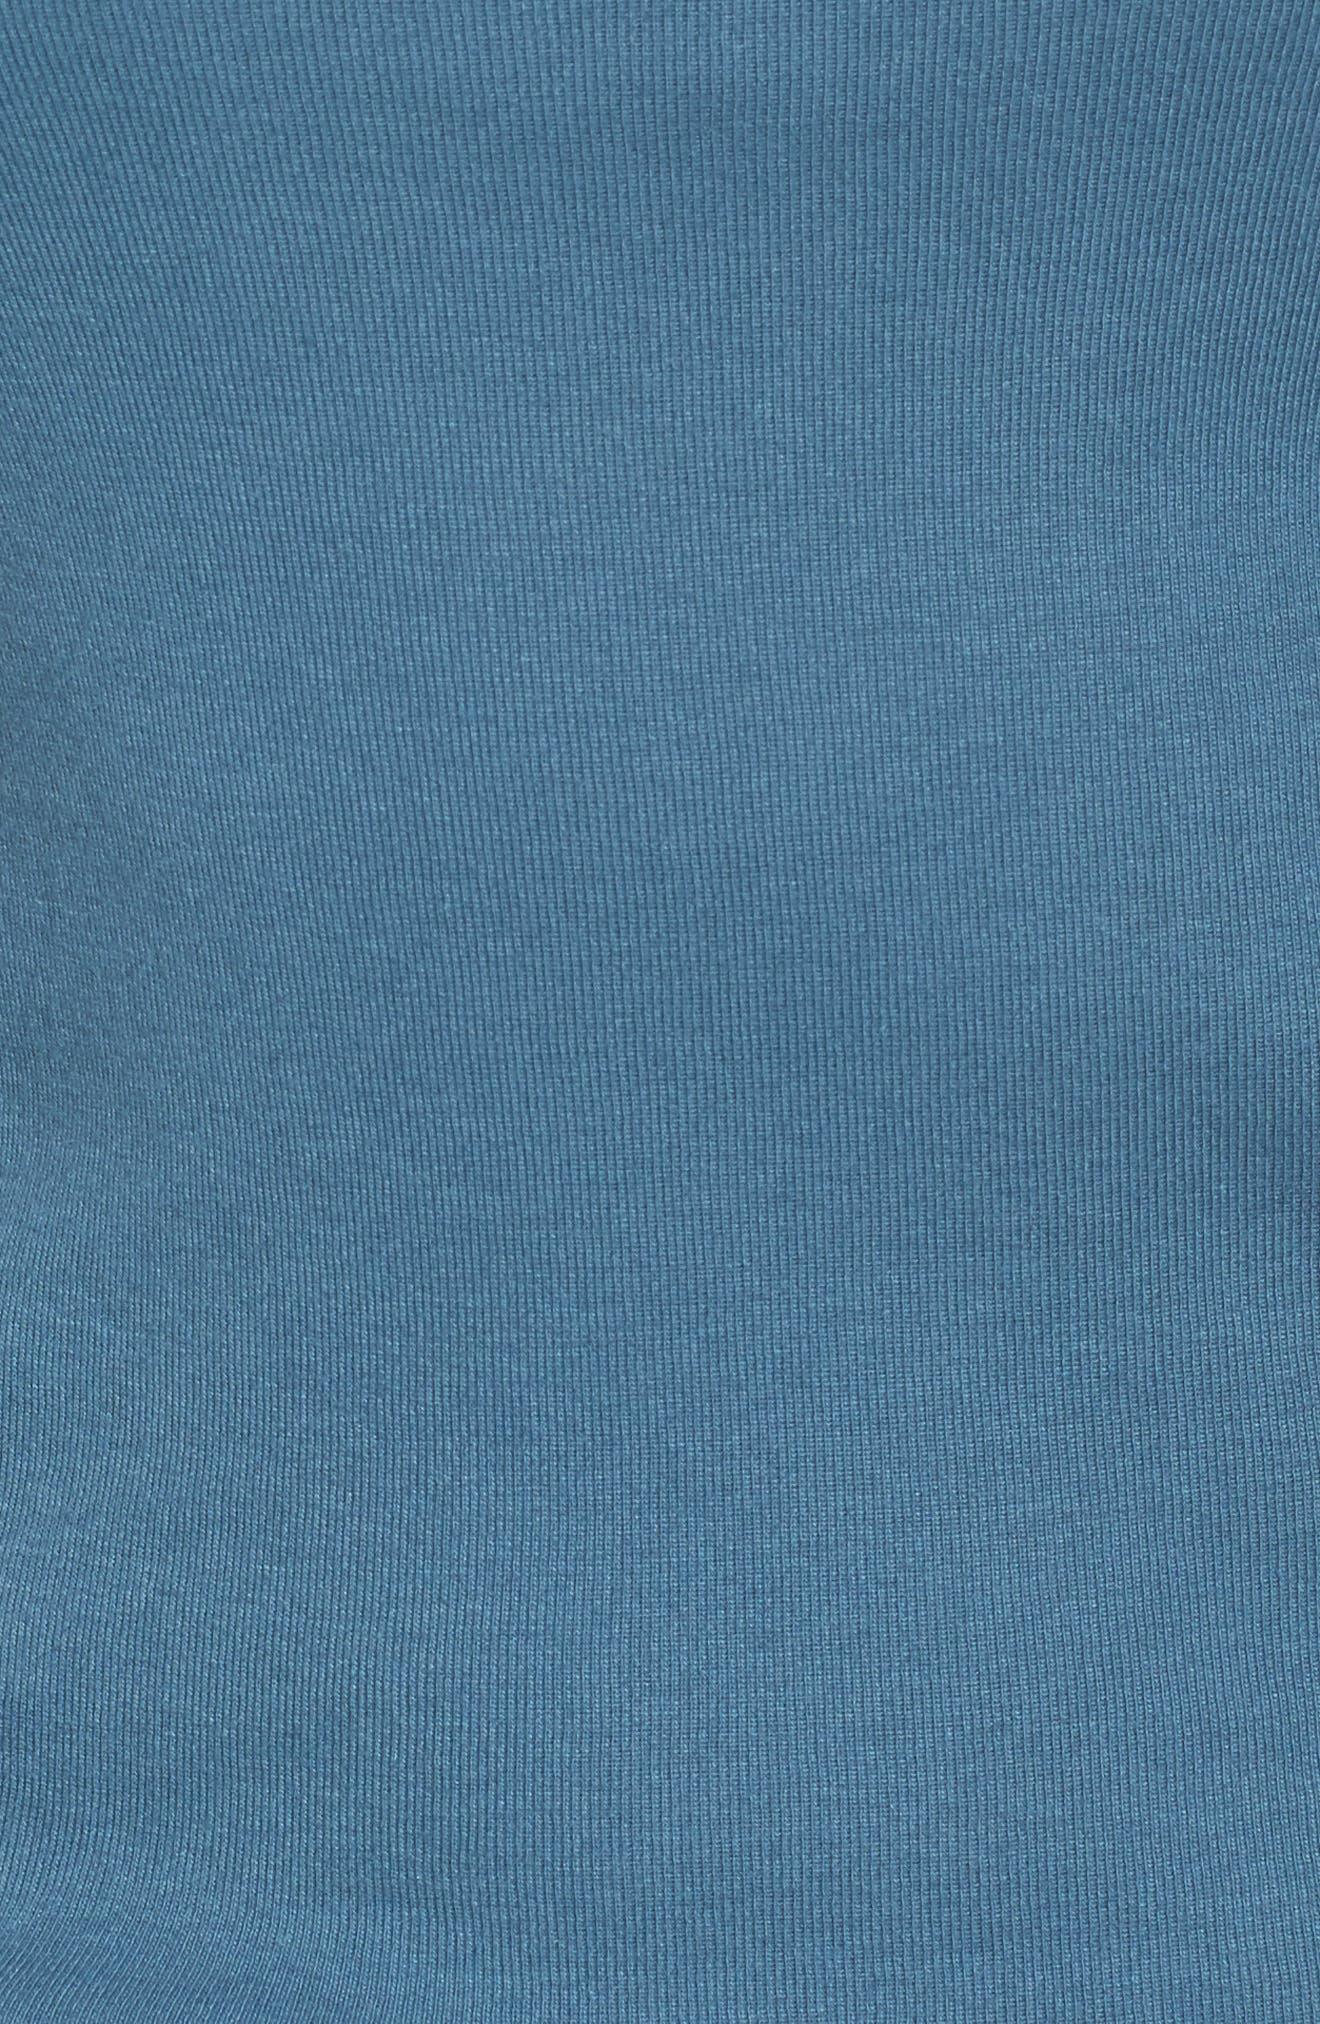 Ballet Neck Cotton & Modal Knit Elbow Sleeve Tee,                             Alternate thumbnail 227, color,